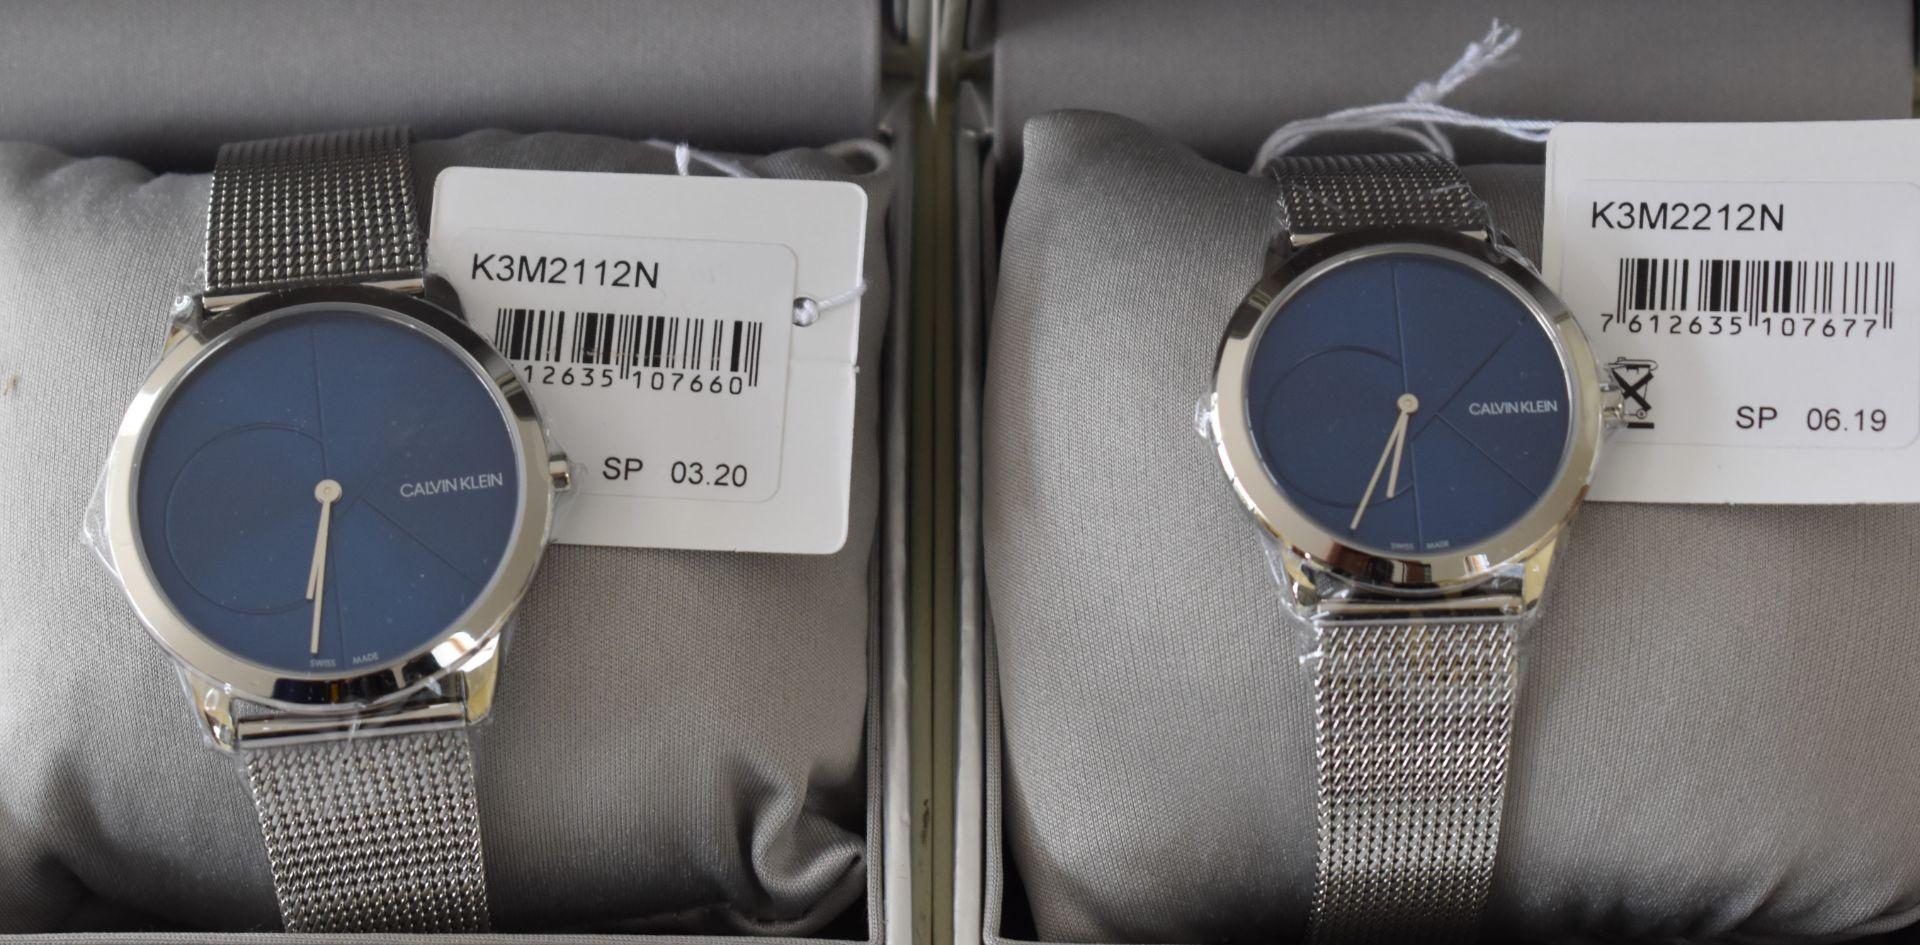 Calvin klein His/Her K3M2112N/K3M2212N Watches - Image 2 of 2